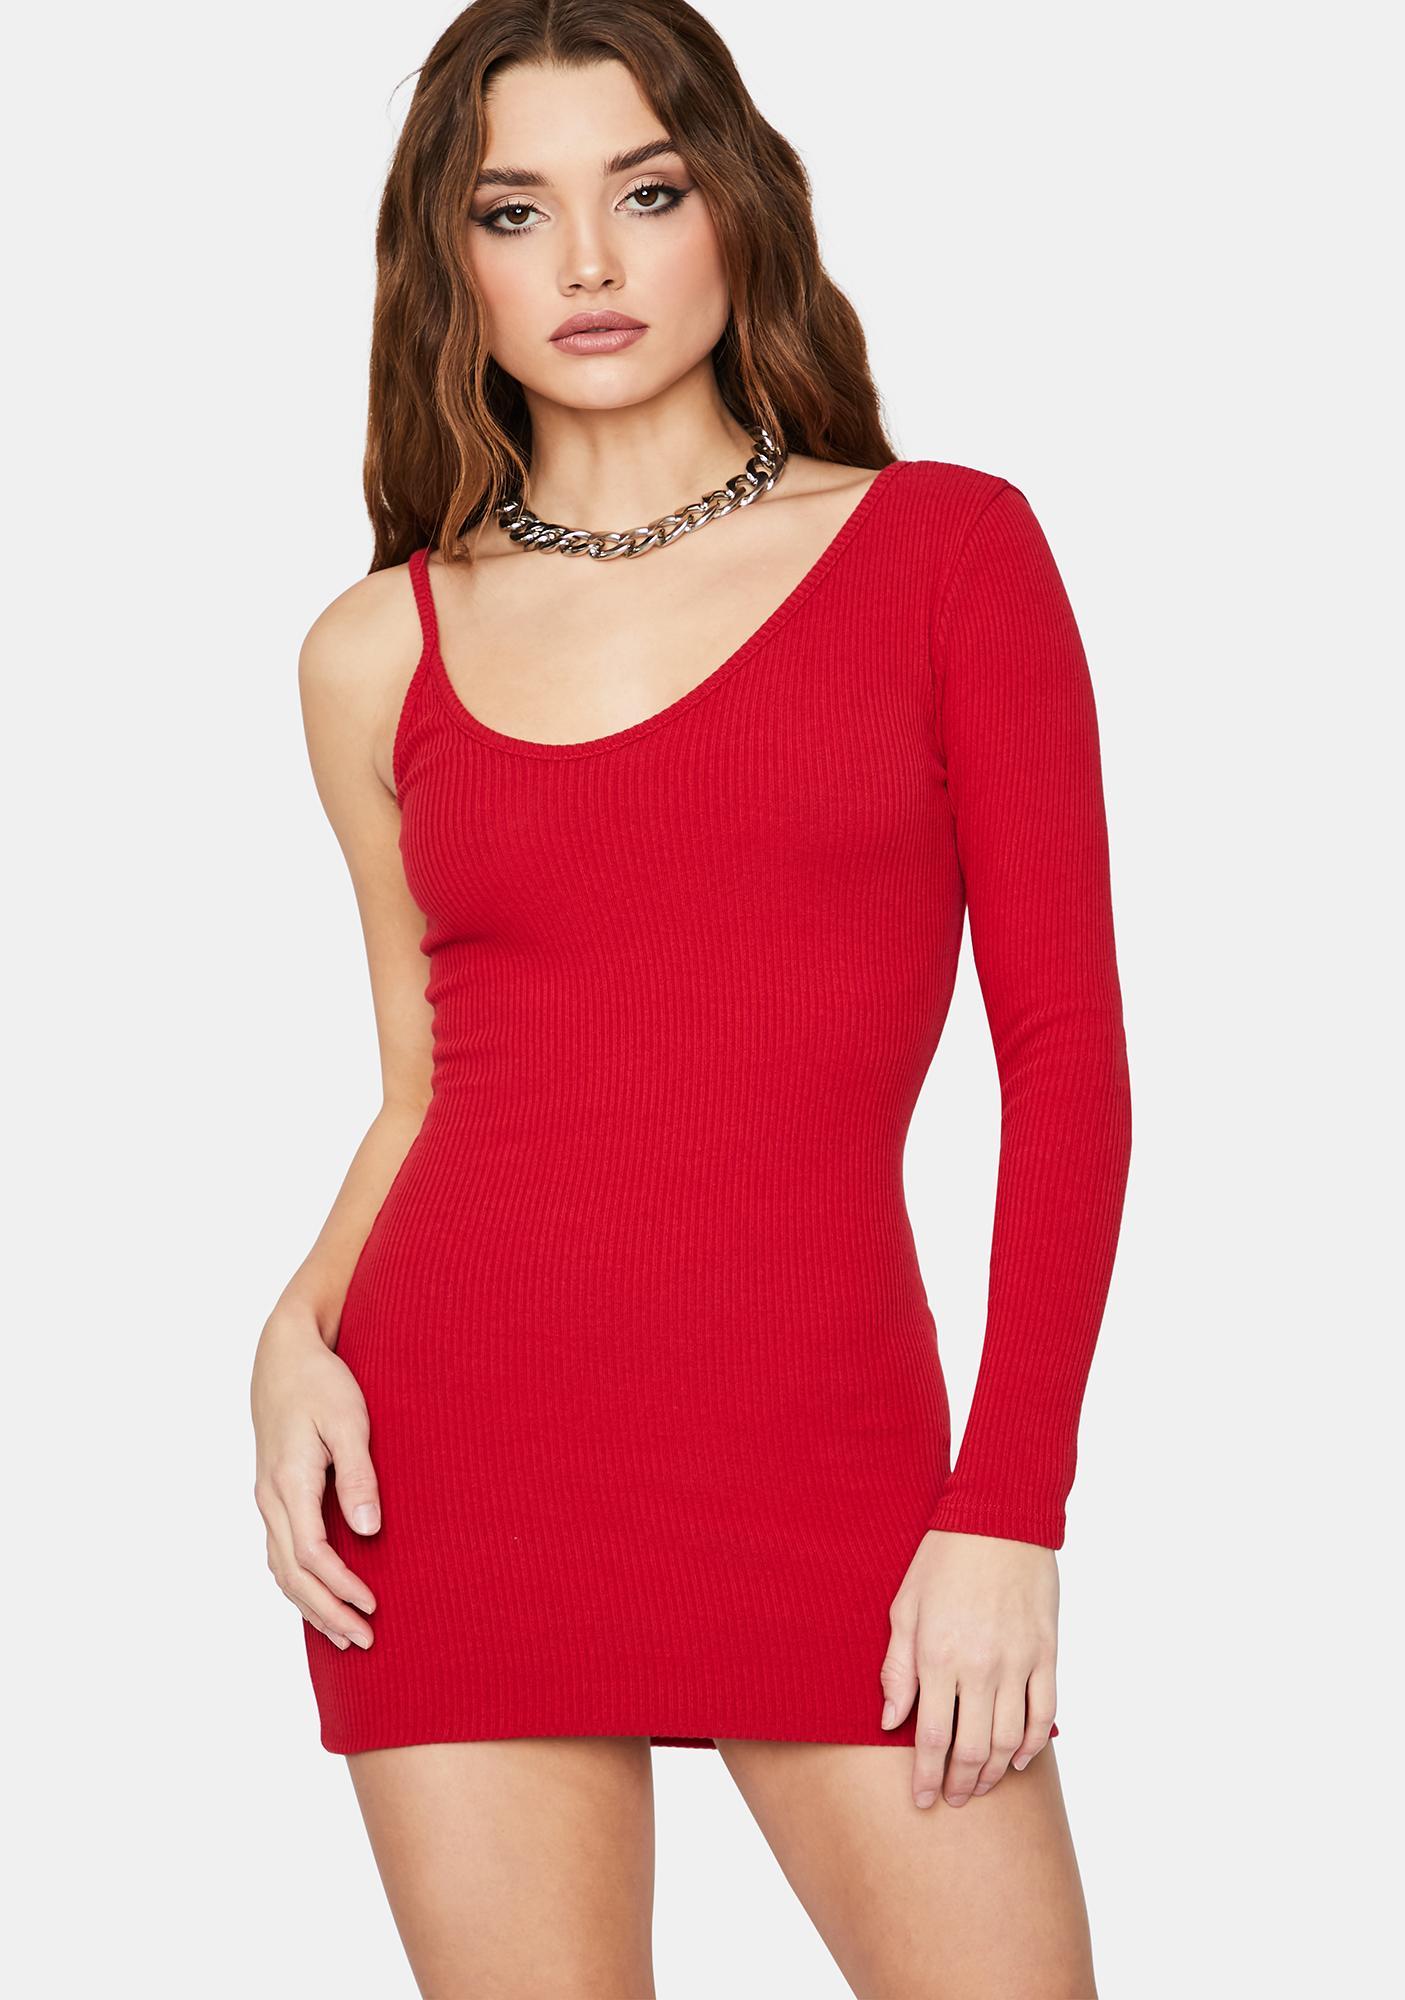 Crimson Too Annoyed One Sleeve Bodycon Mini Dress